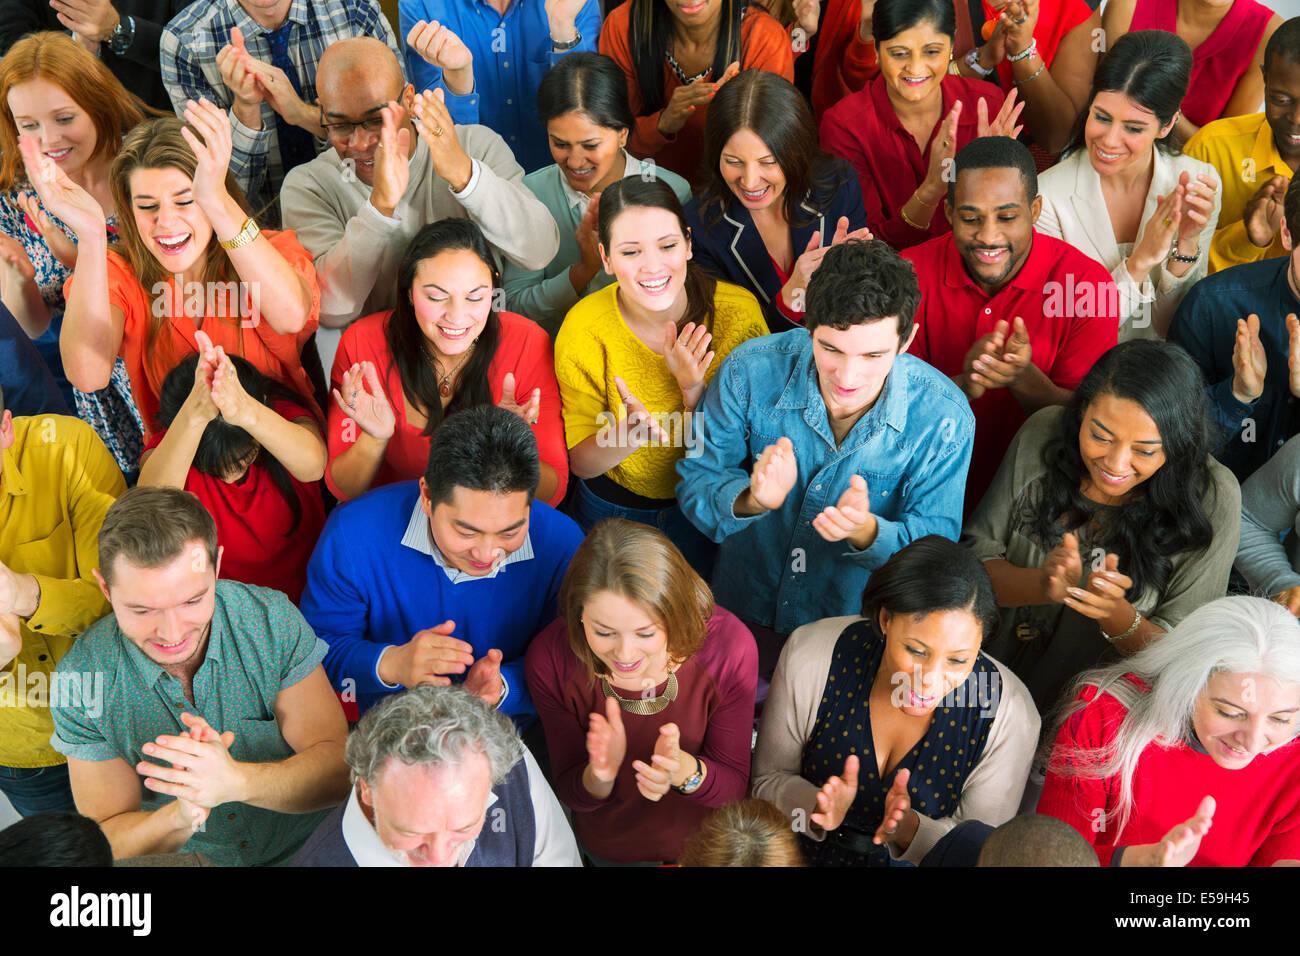 Foule diversifiée clapping Photo Stock